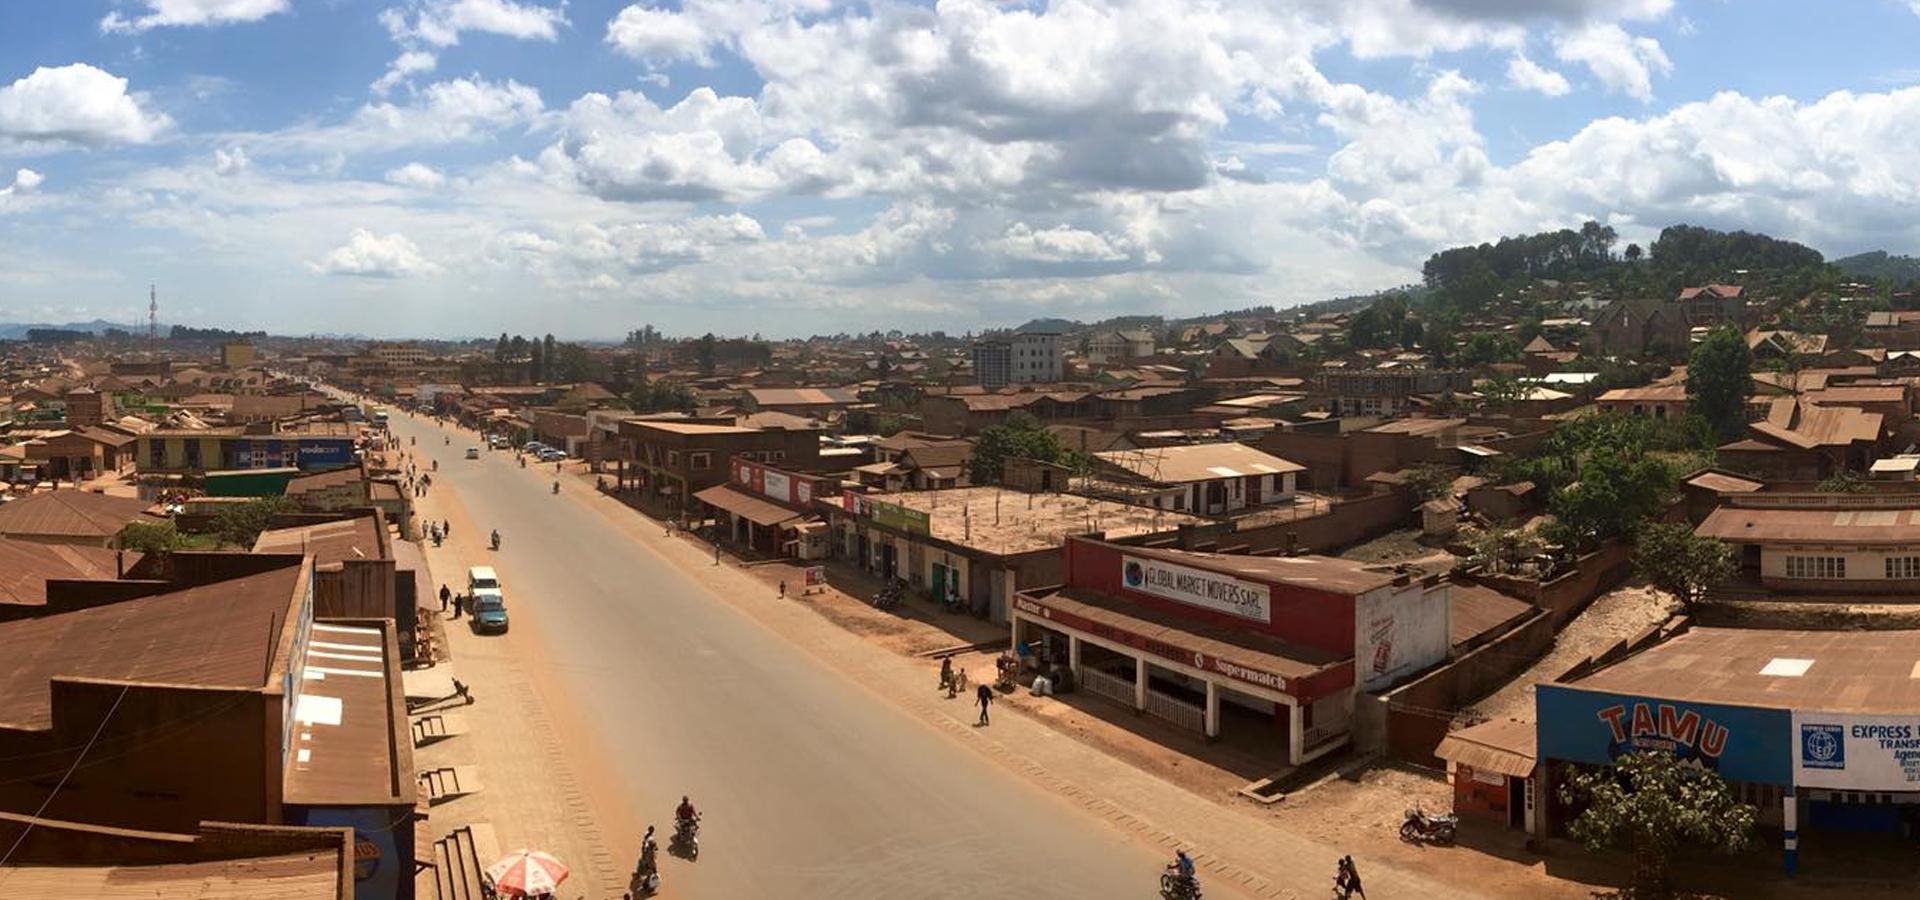 Peer-to-peer advisory in Butembo, Nord-Kivu, Democratic Republic of the Congo